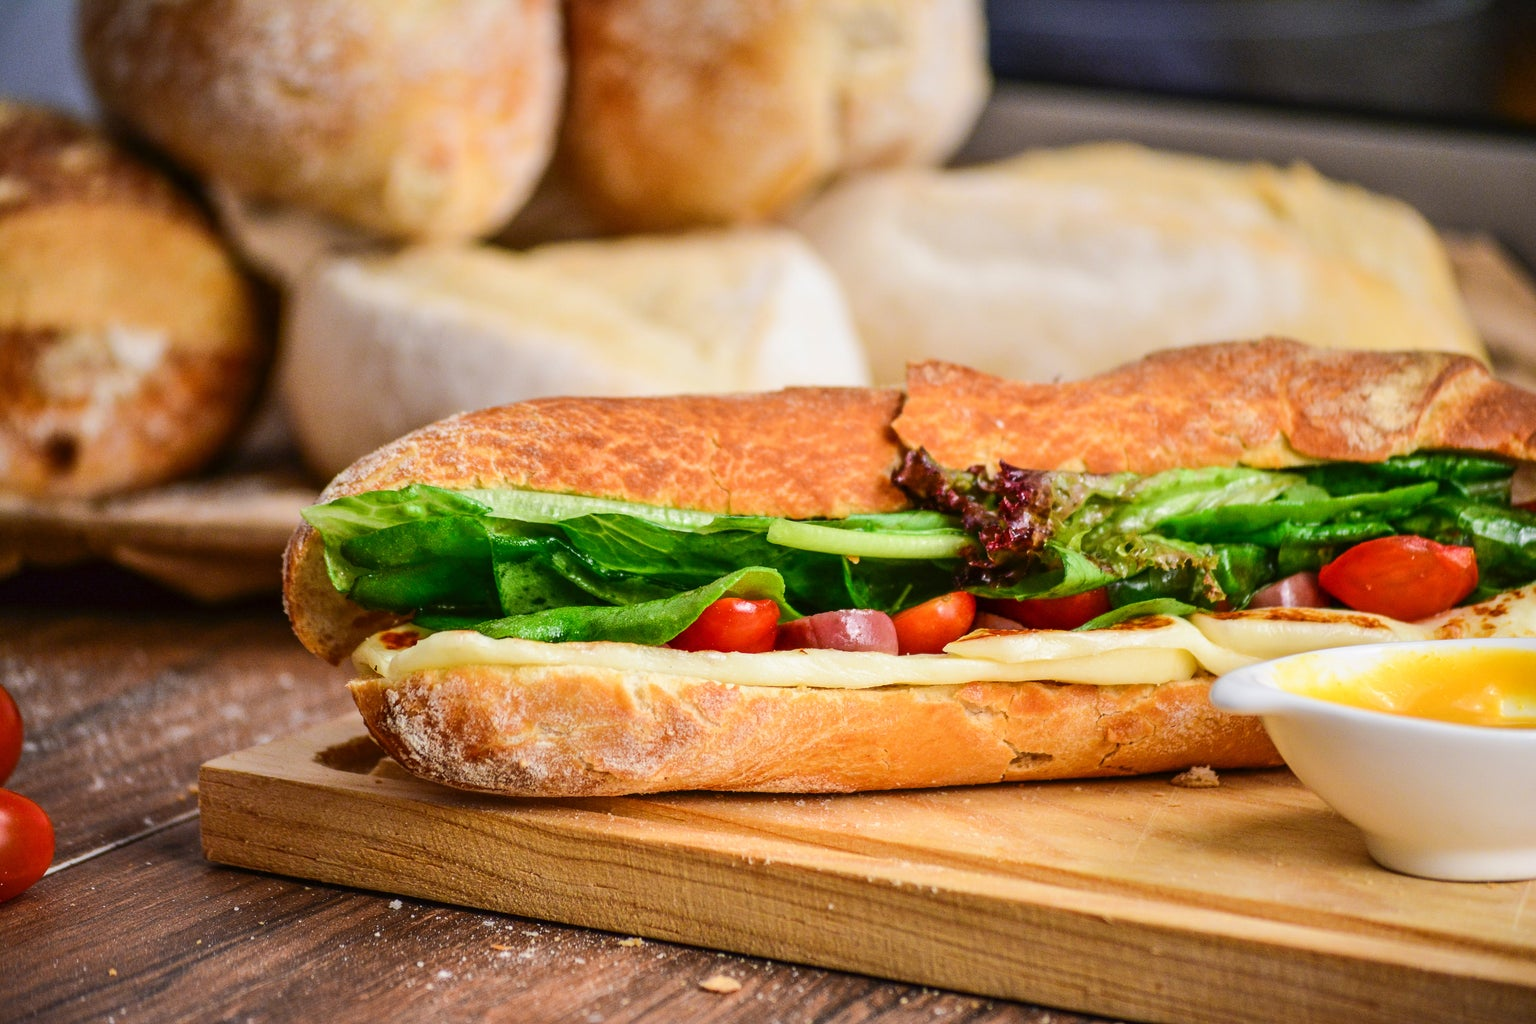 Sandwich on table